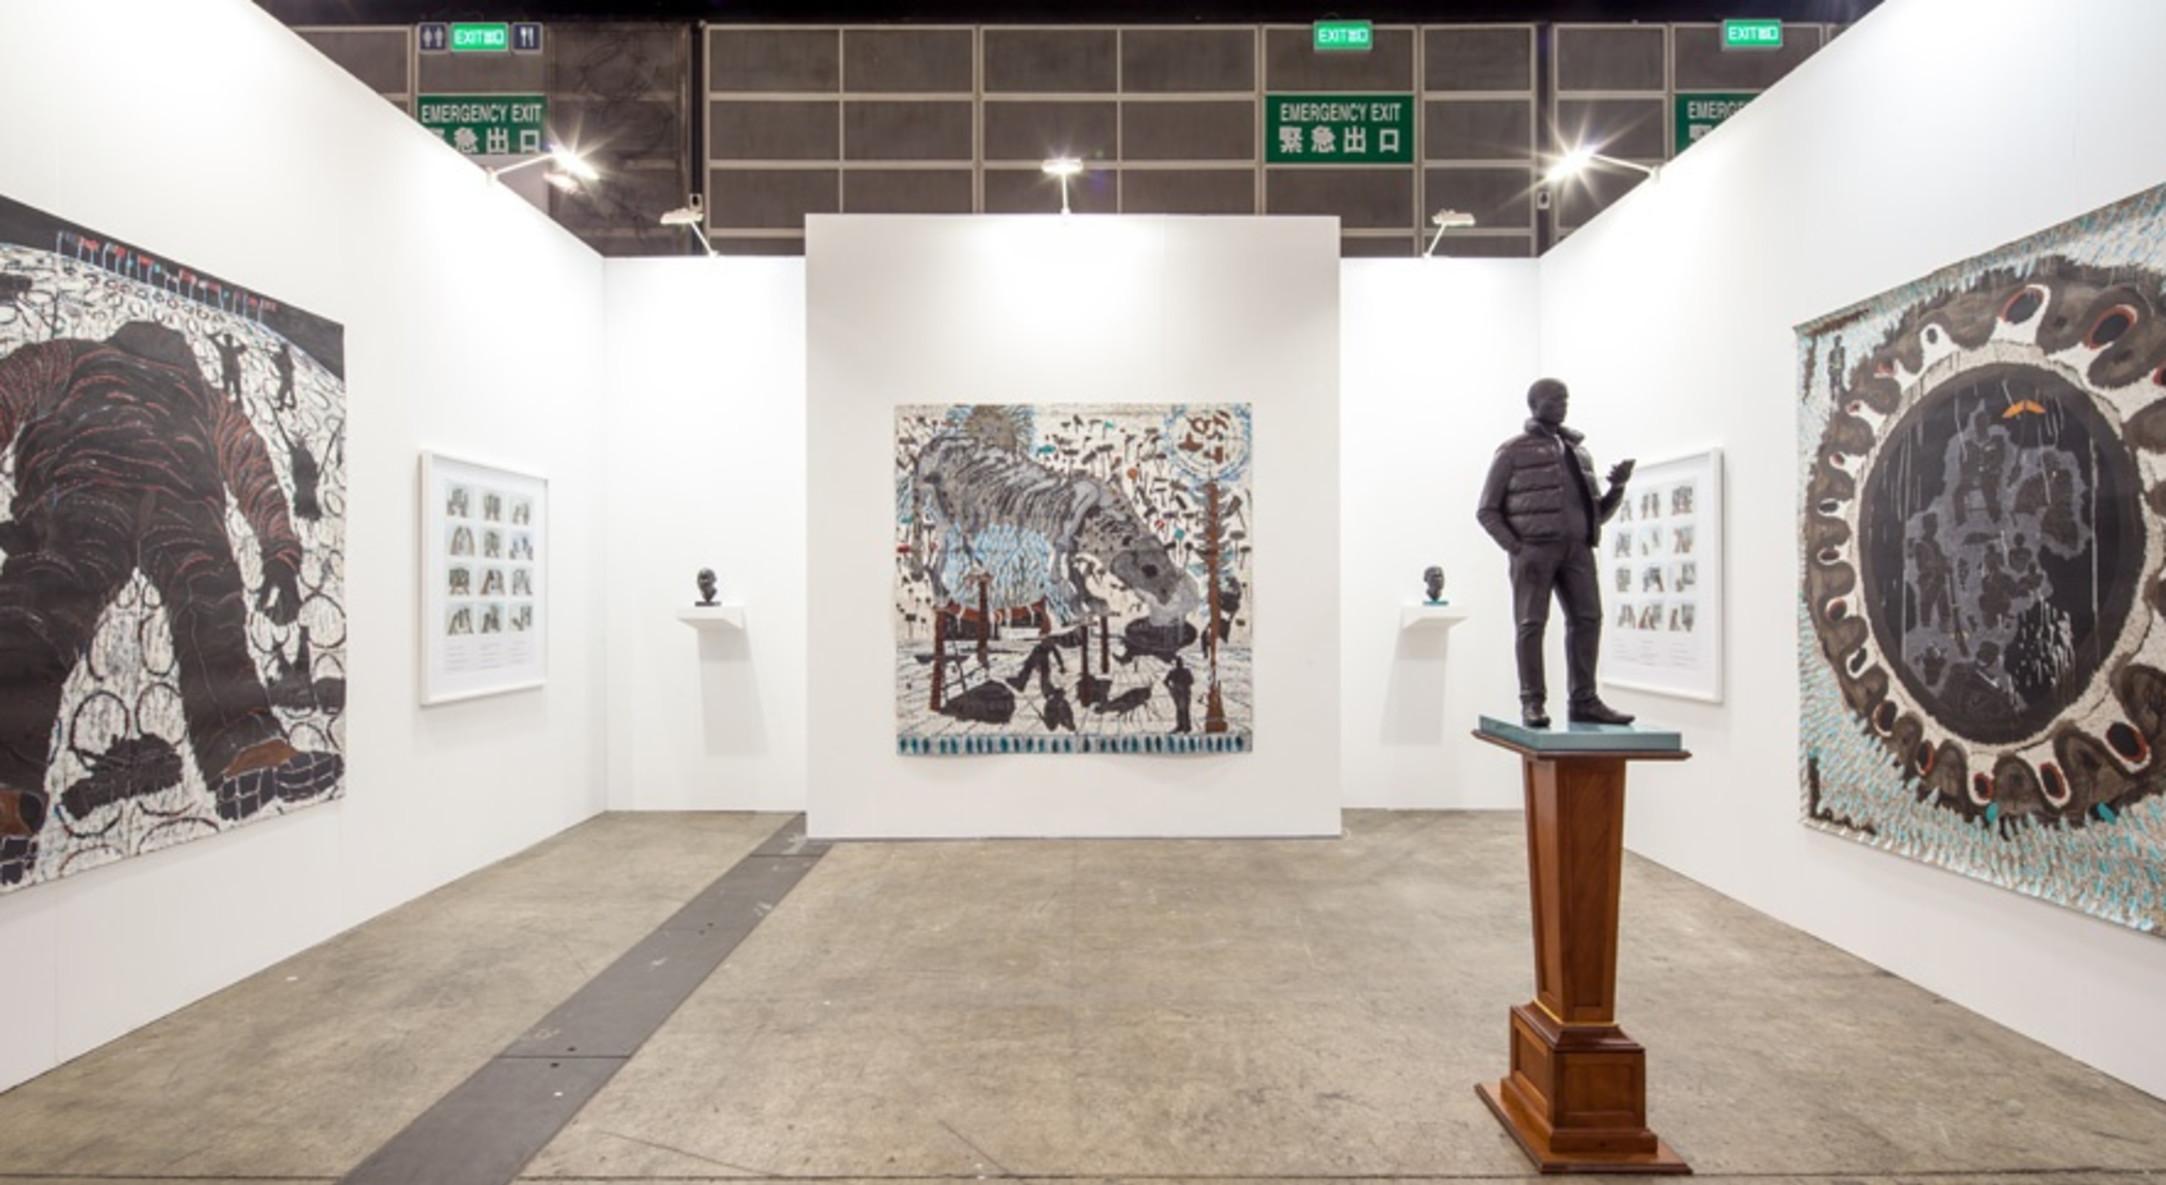 Installation view of Thomas J Price and Omar Ba in Hales Gallery Booth at Art Basel Hong Kong 2014